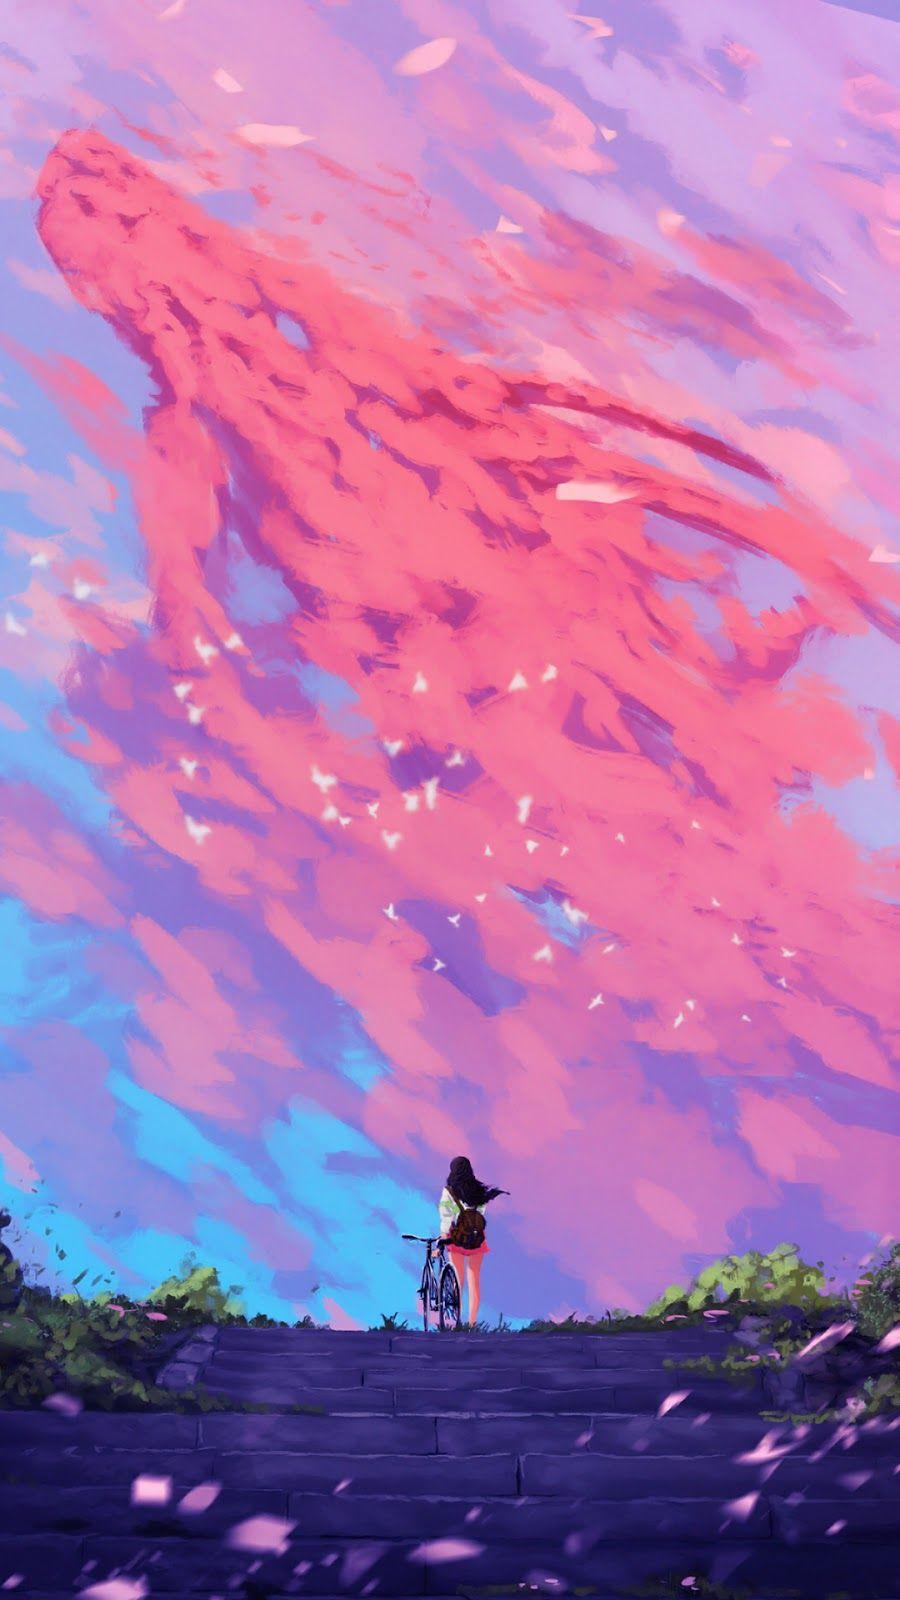 Spirited Away Wallpaper Hd Heroscreen In 2020 Studio Ghibli Spirited Away Spirited Away Wallpaper Studio Ghibli Background